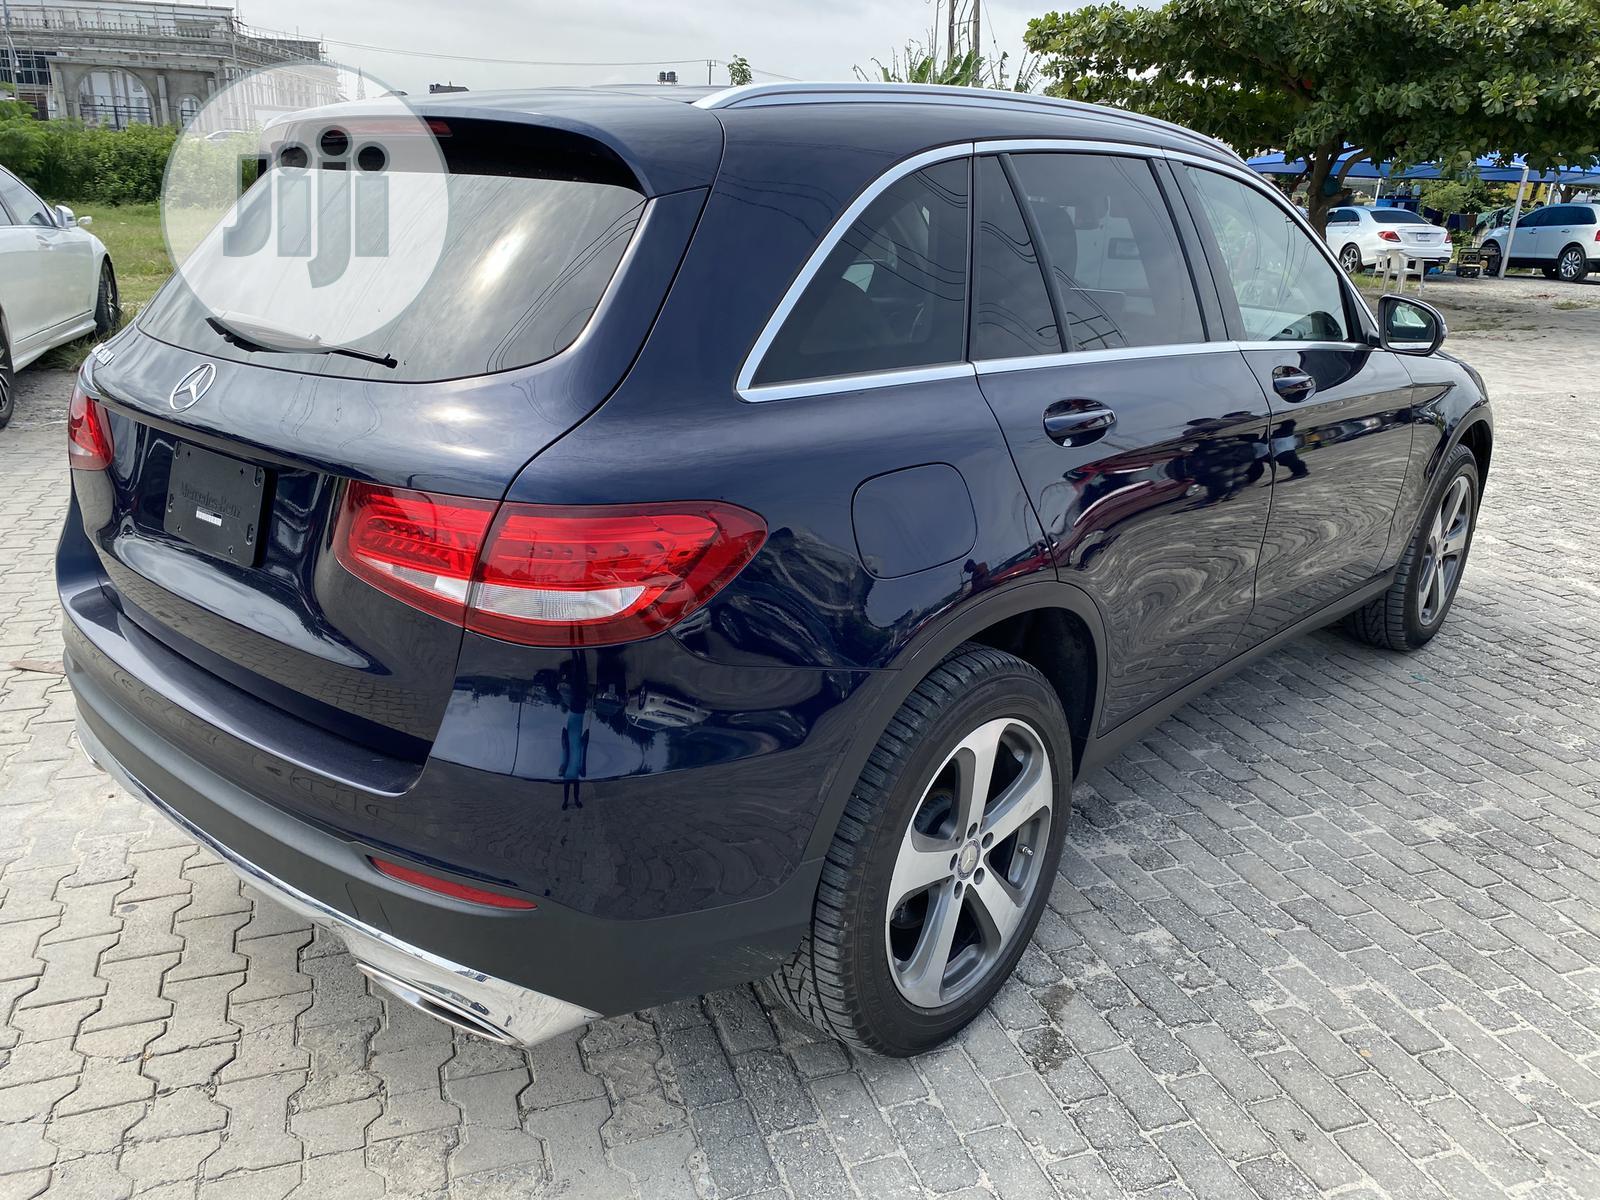 Mercedes-Benz GLC-Class 2016 Blue   Cars for sale in Lekki, Lagos State, Nigeria